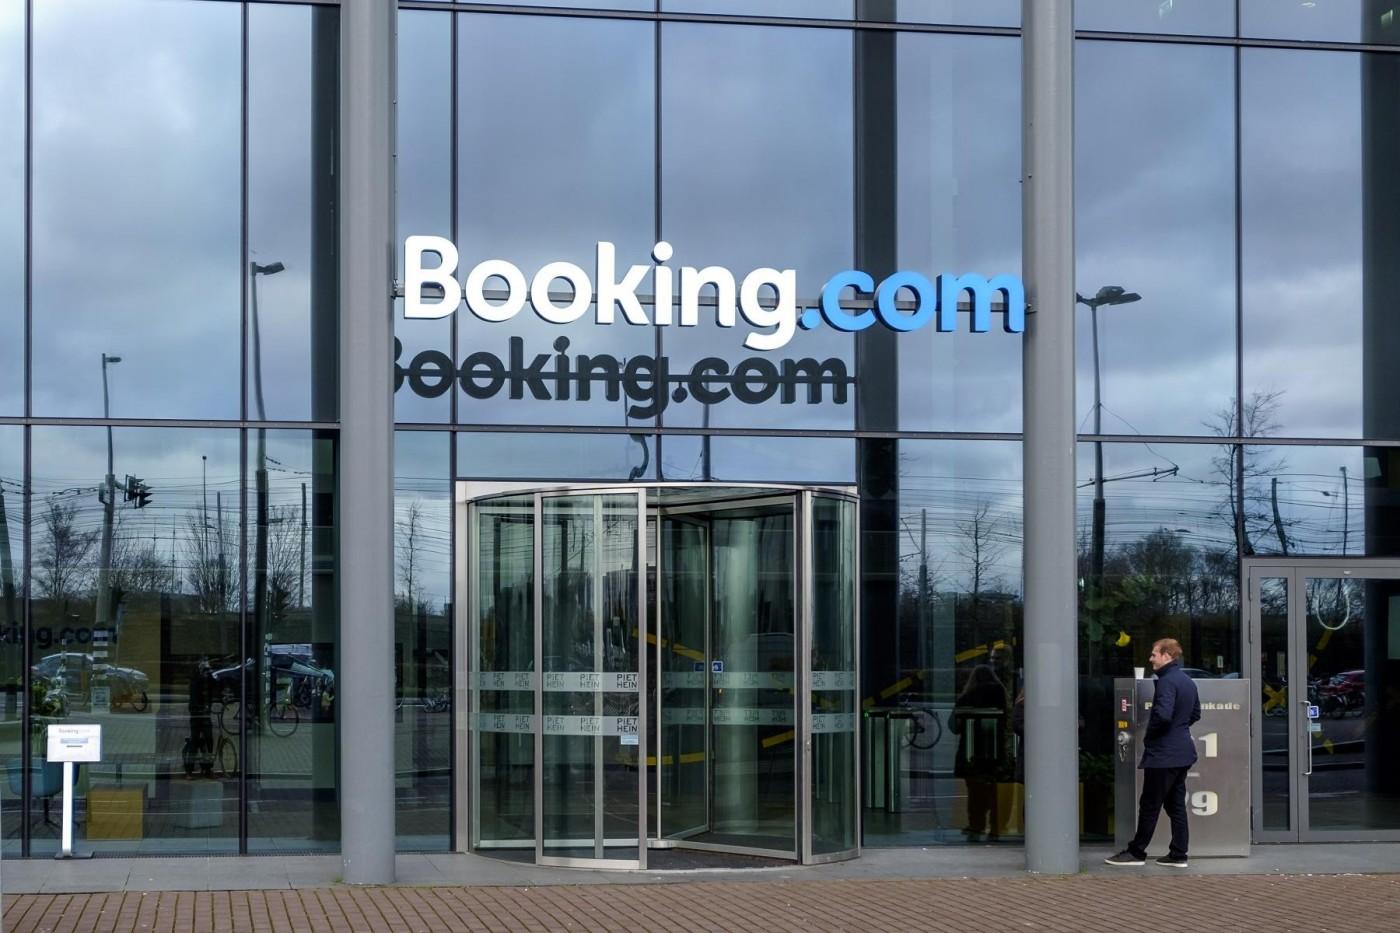 Booking.com狂投叫車平台,背後有什麼盤算?